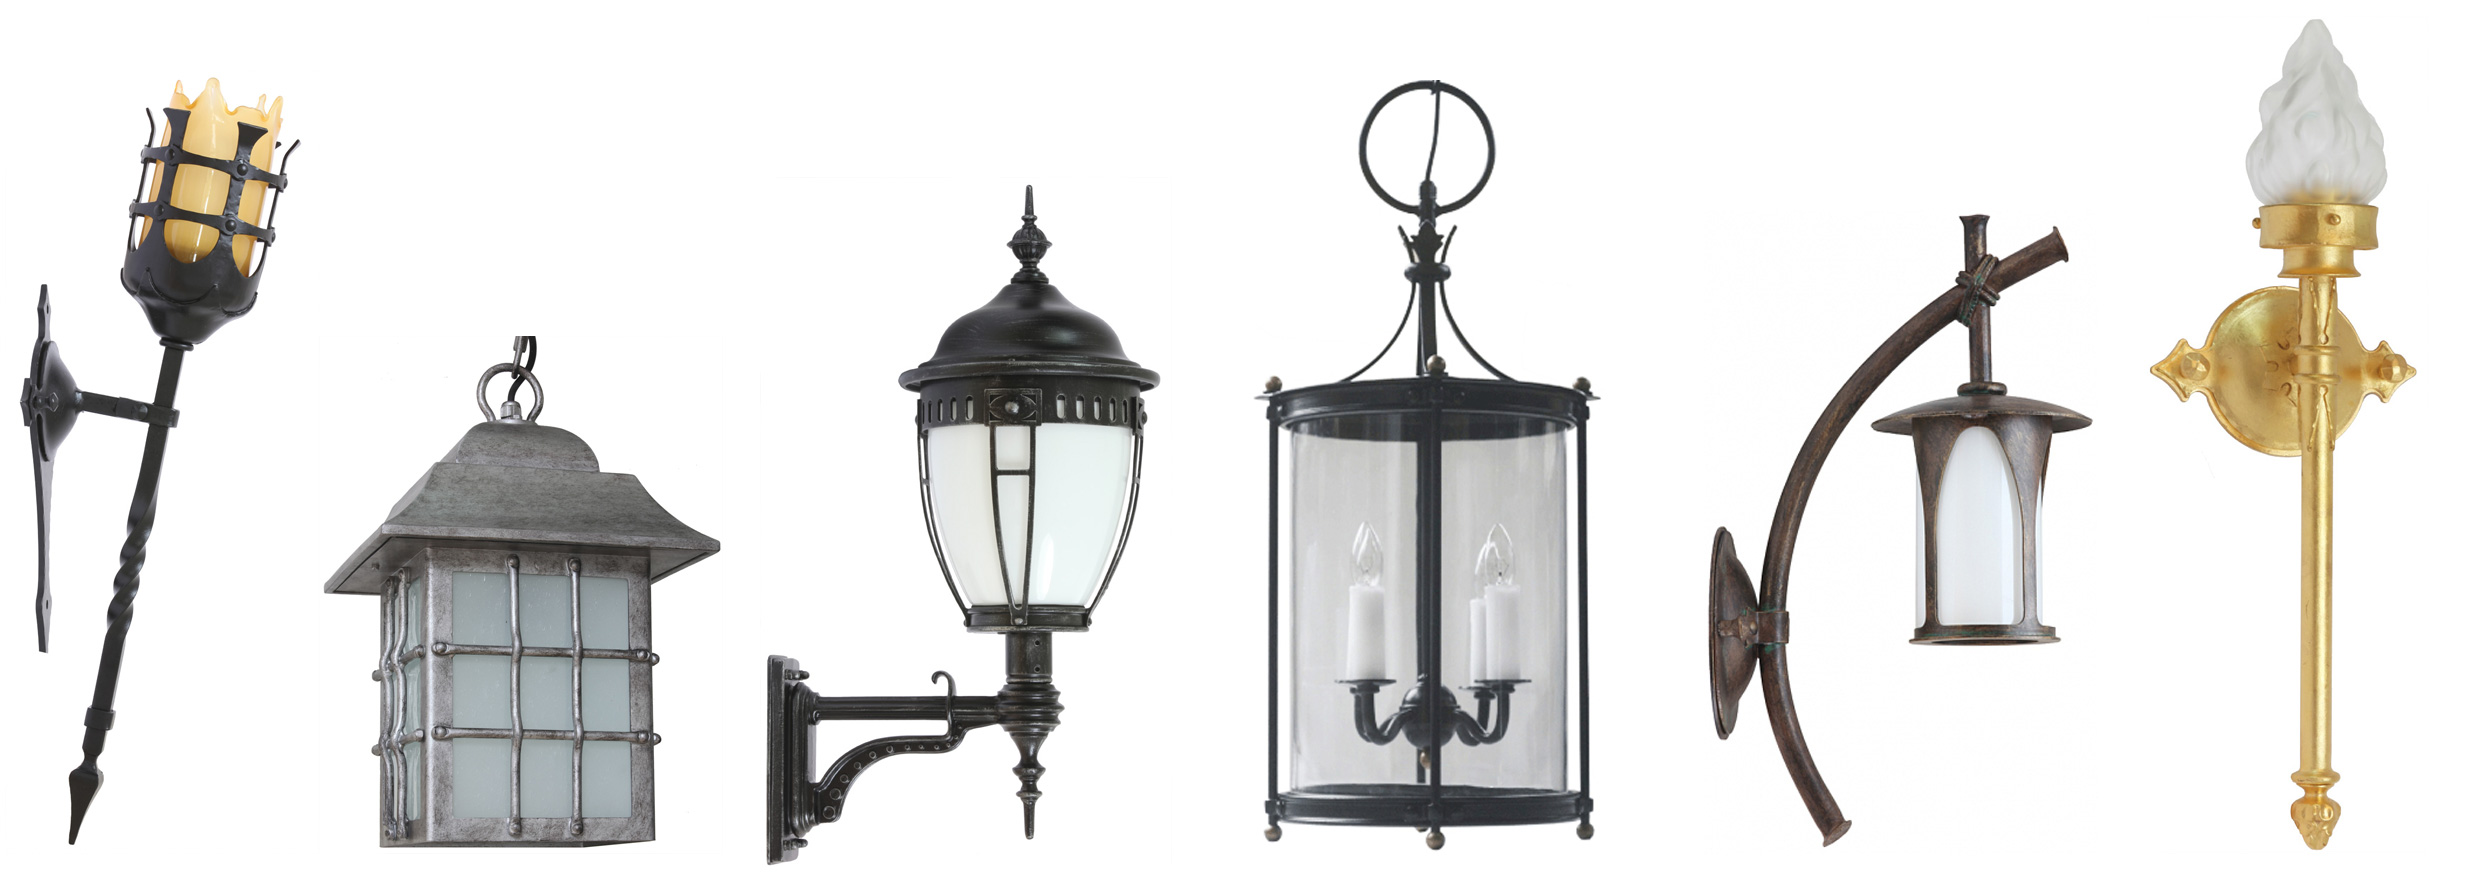 rustikale au enbeleuchtung klassisch und historisch. Black Bedroom Furniture Sets. Home Design Ideas